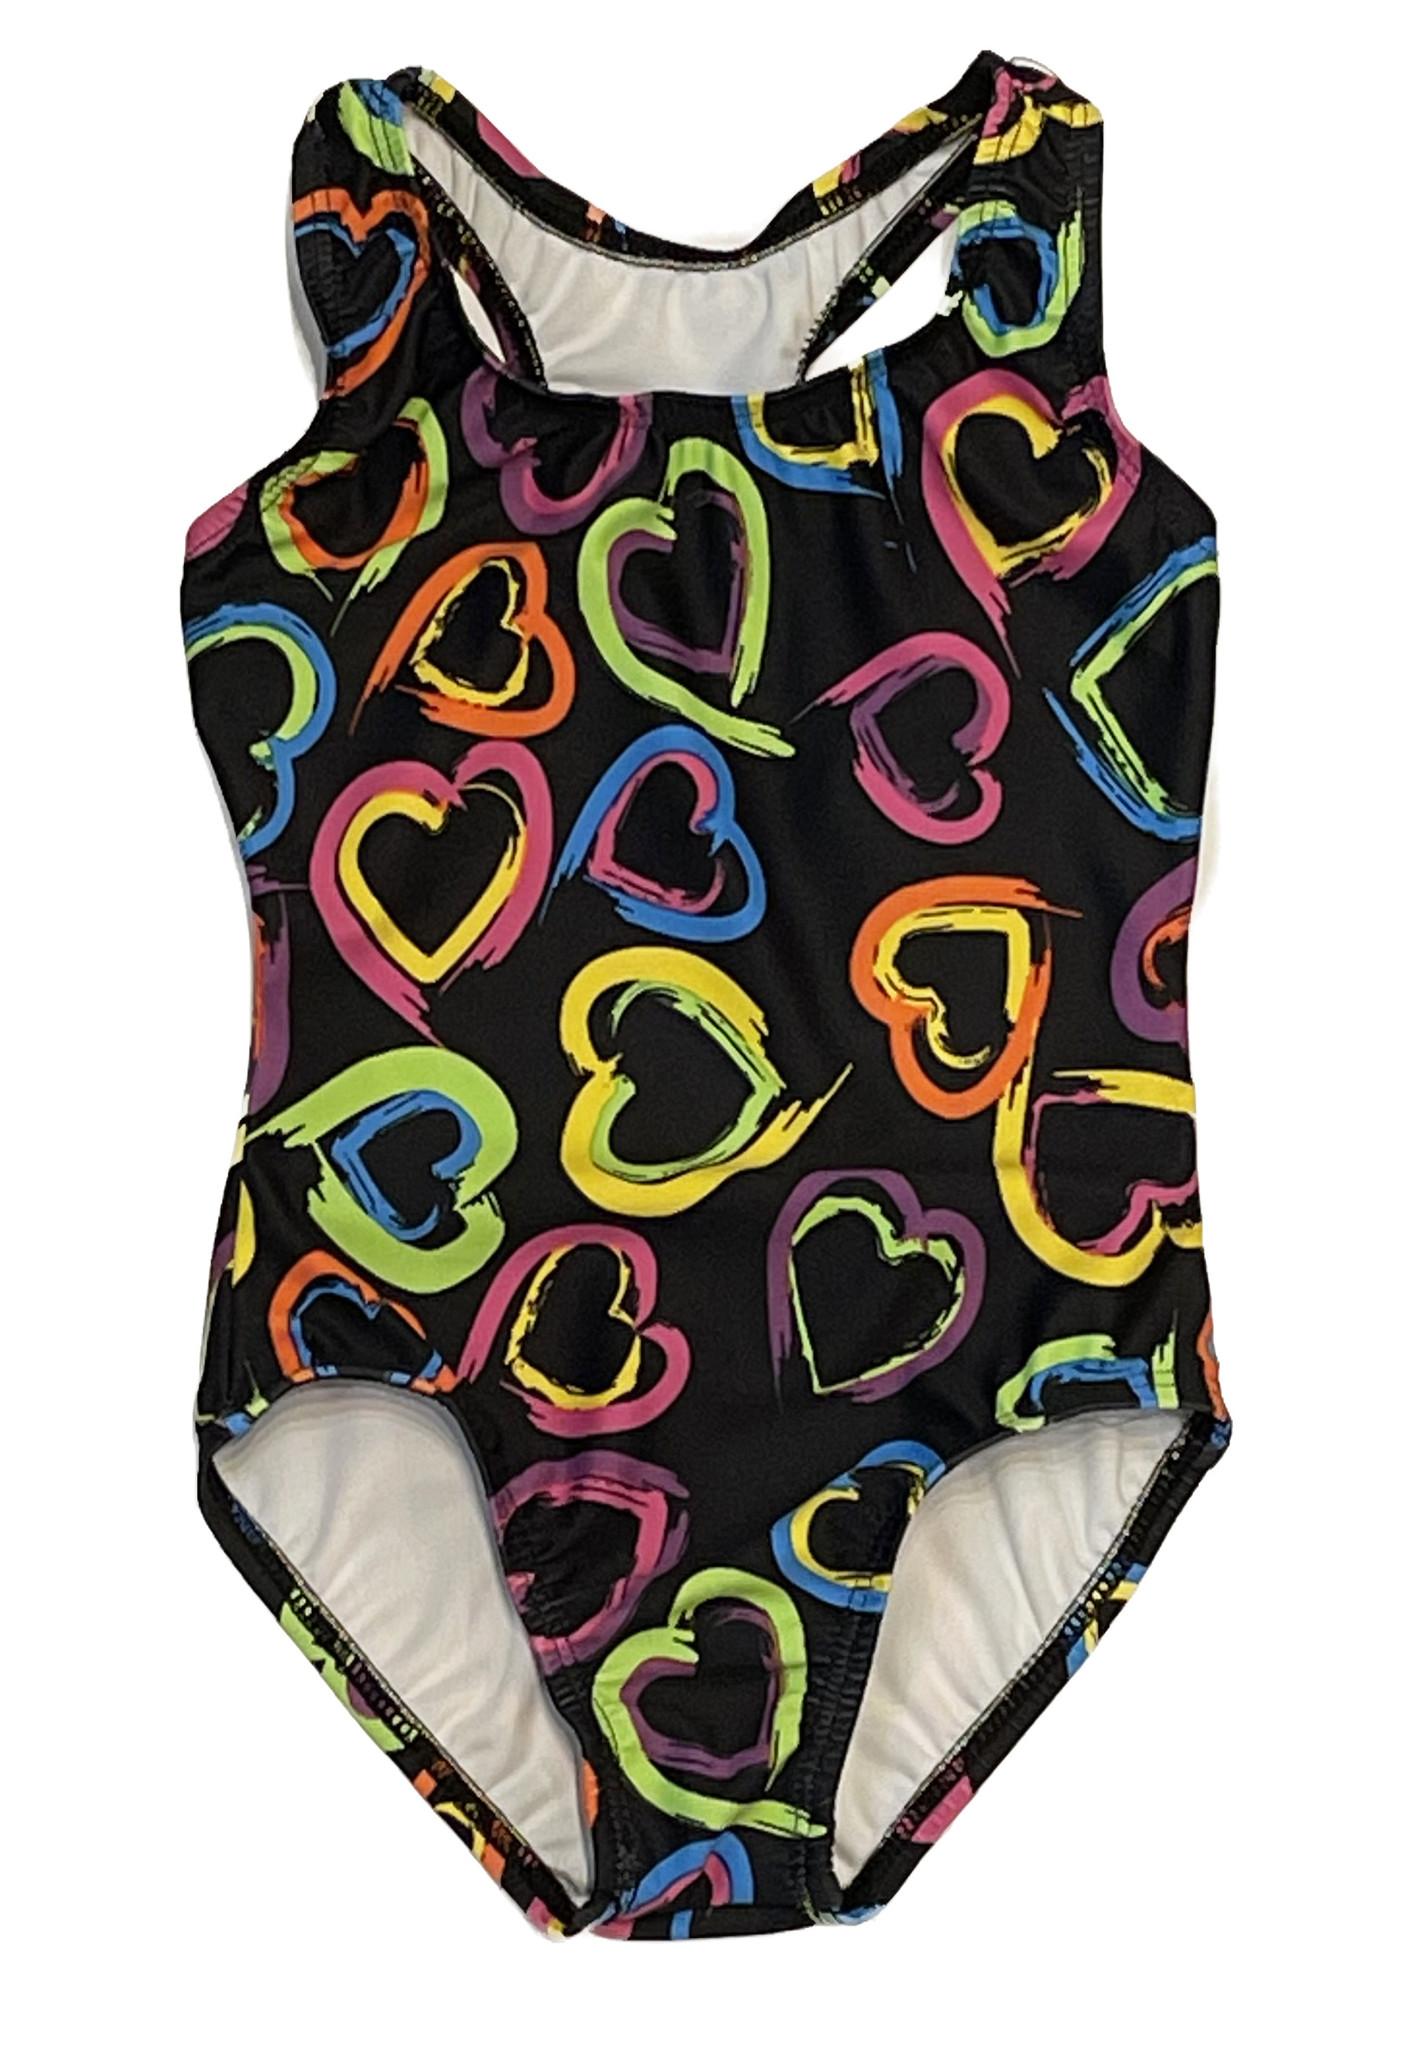 Dori Neon Hearts Swimsuit